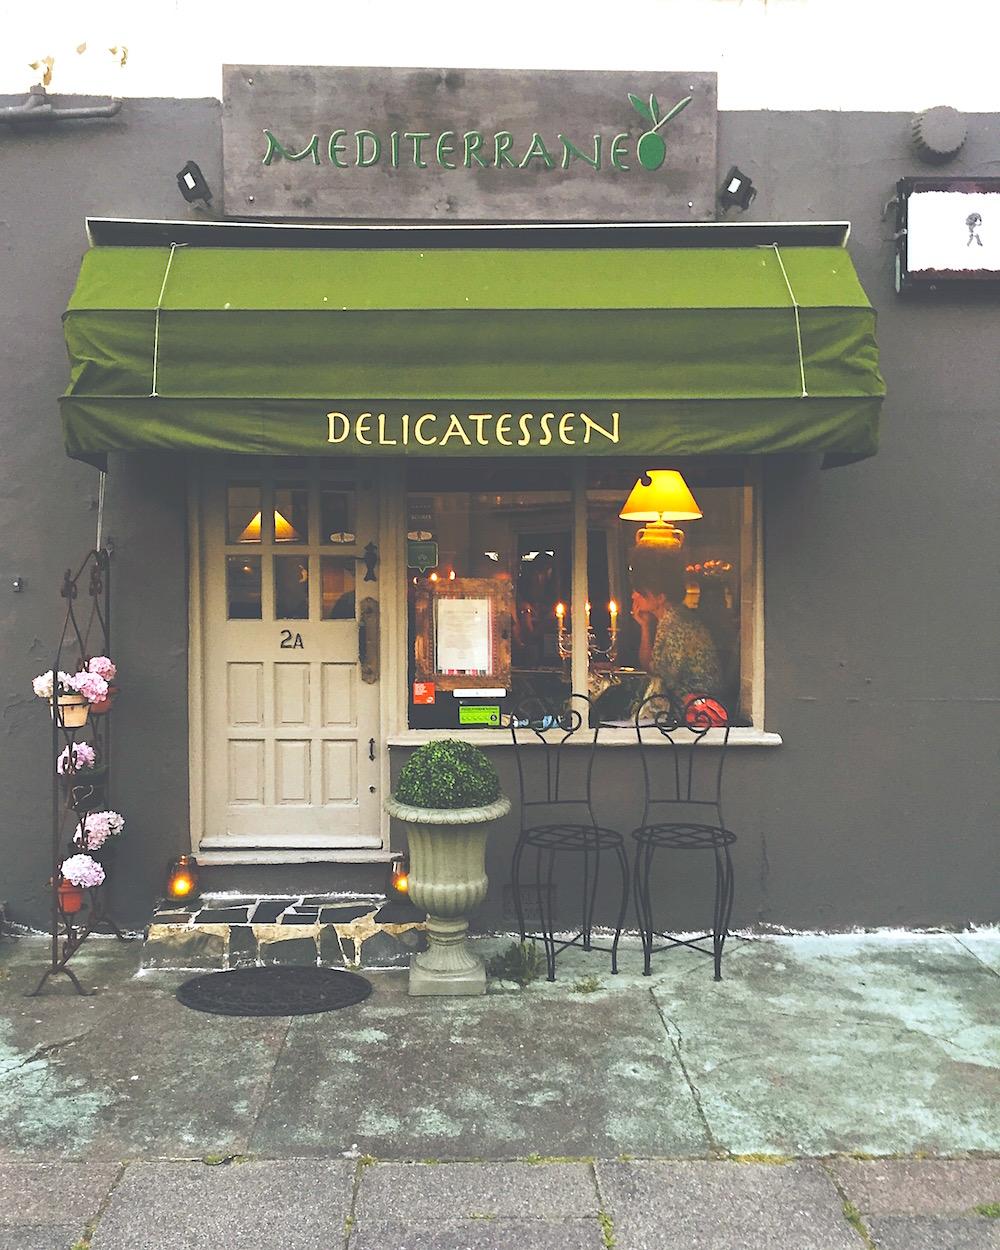 mediterraneo deli brighton local gem restaurant